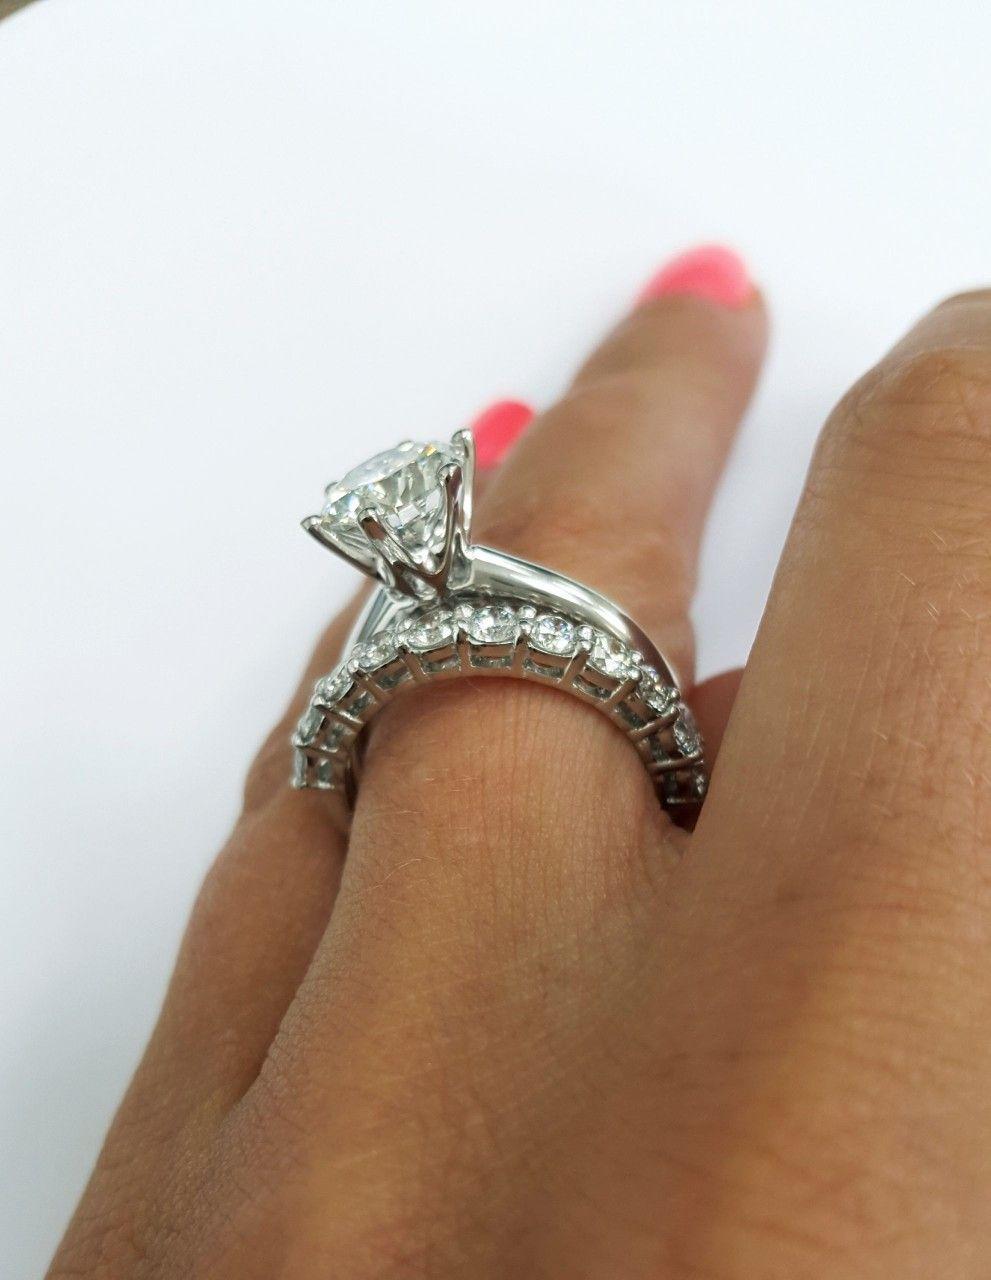 Round Solitaire Diamond Engagement Ring And Half Eternity Diamond Wedding Band Set Vin Solitaire Wedding Ring Set Diamond Wedding Band Sets Diamond Engagement